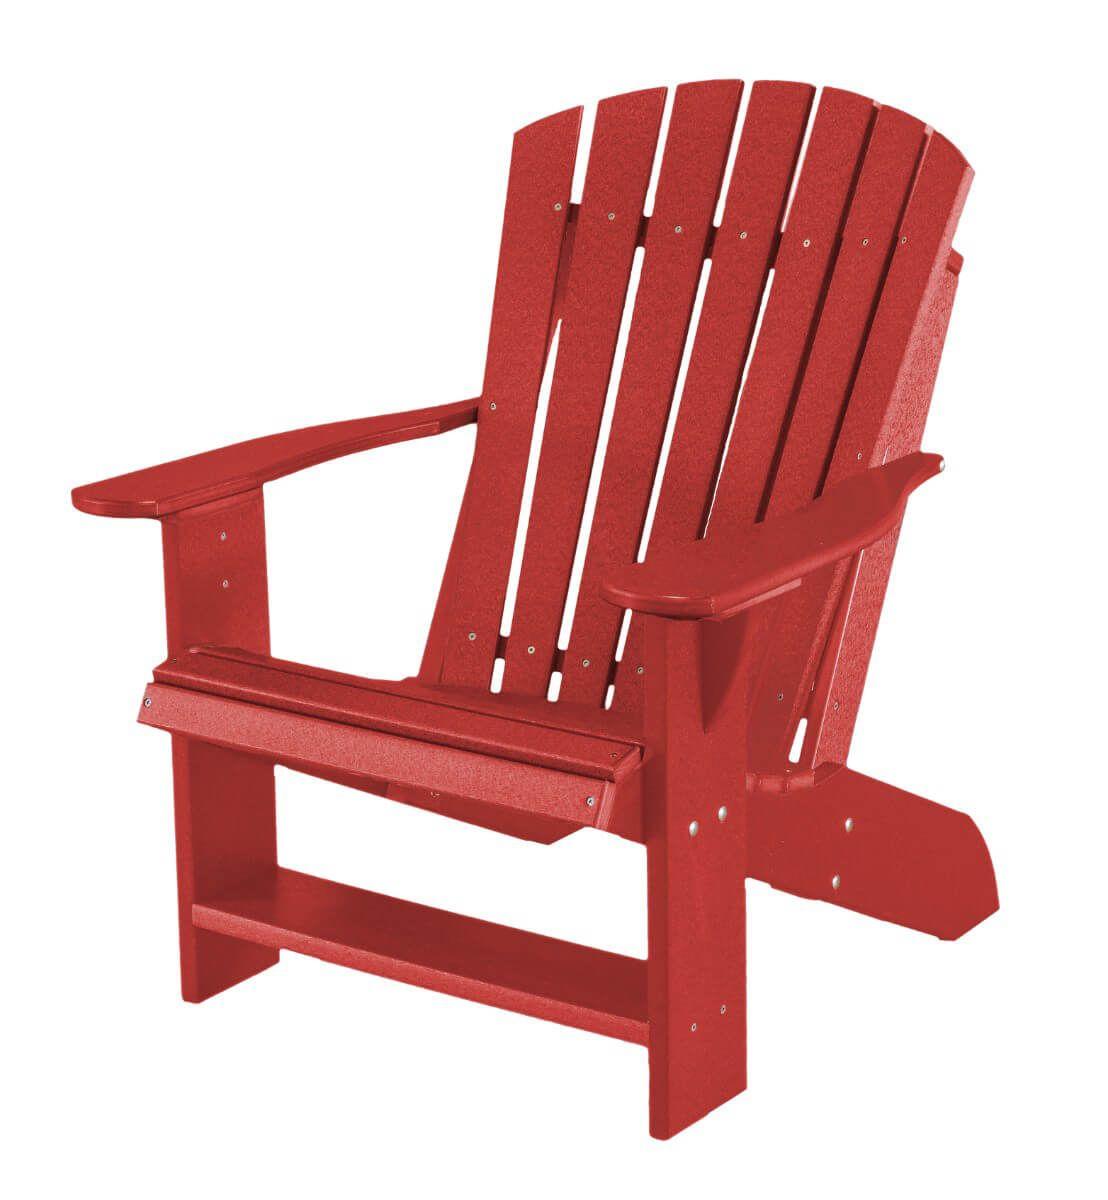 Cardinal Red Sidra Adirondack Chair